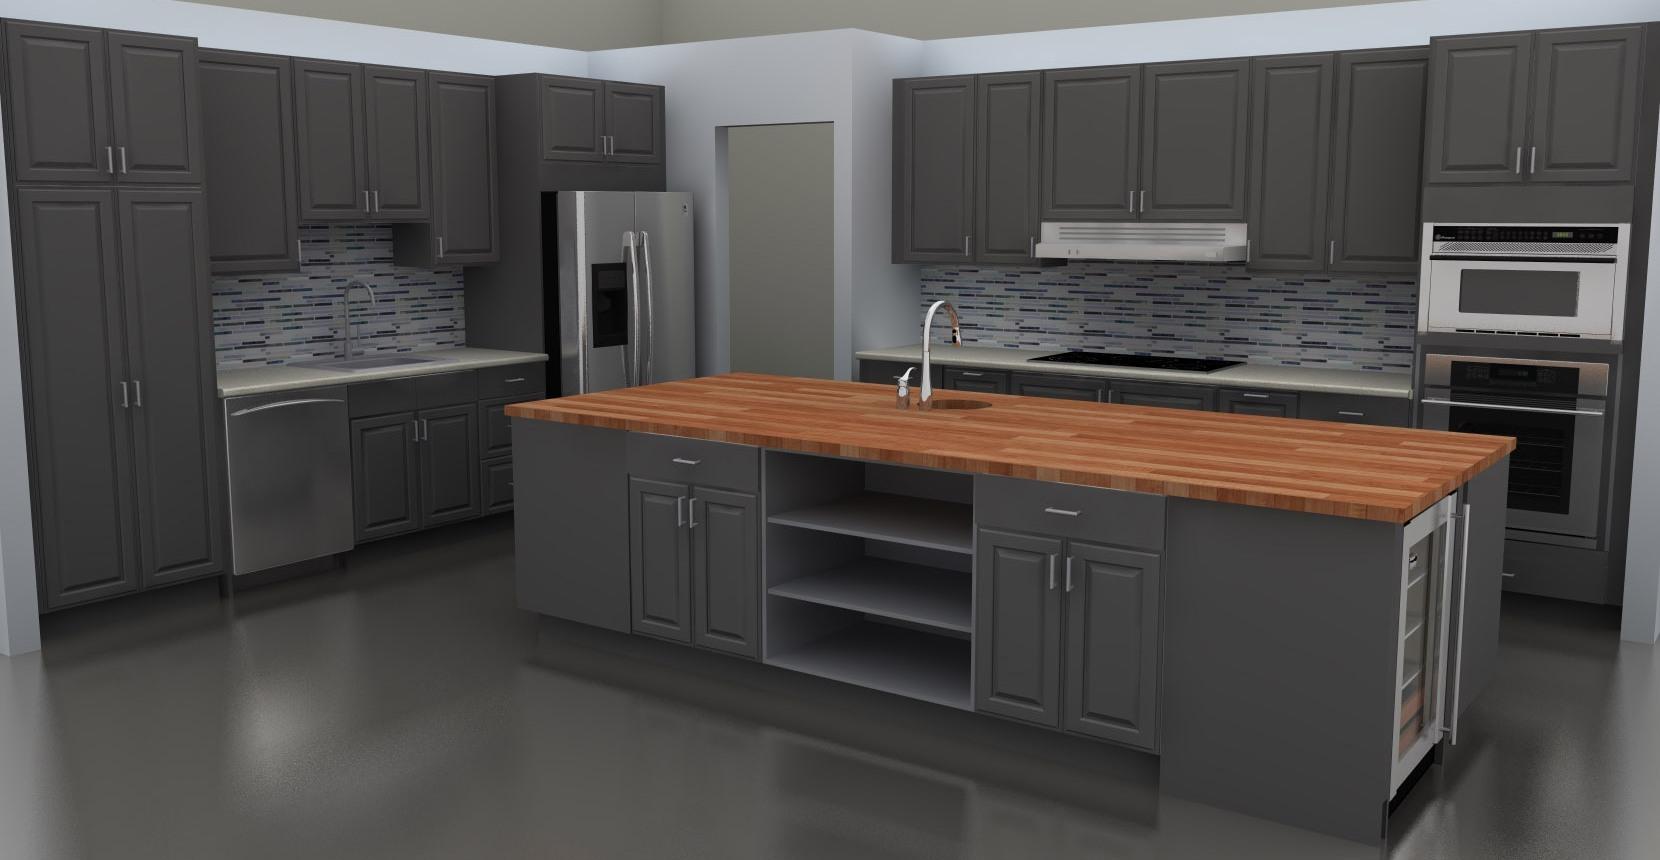 gray kitchen cabinets ideas photo - 10